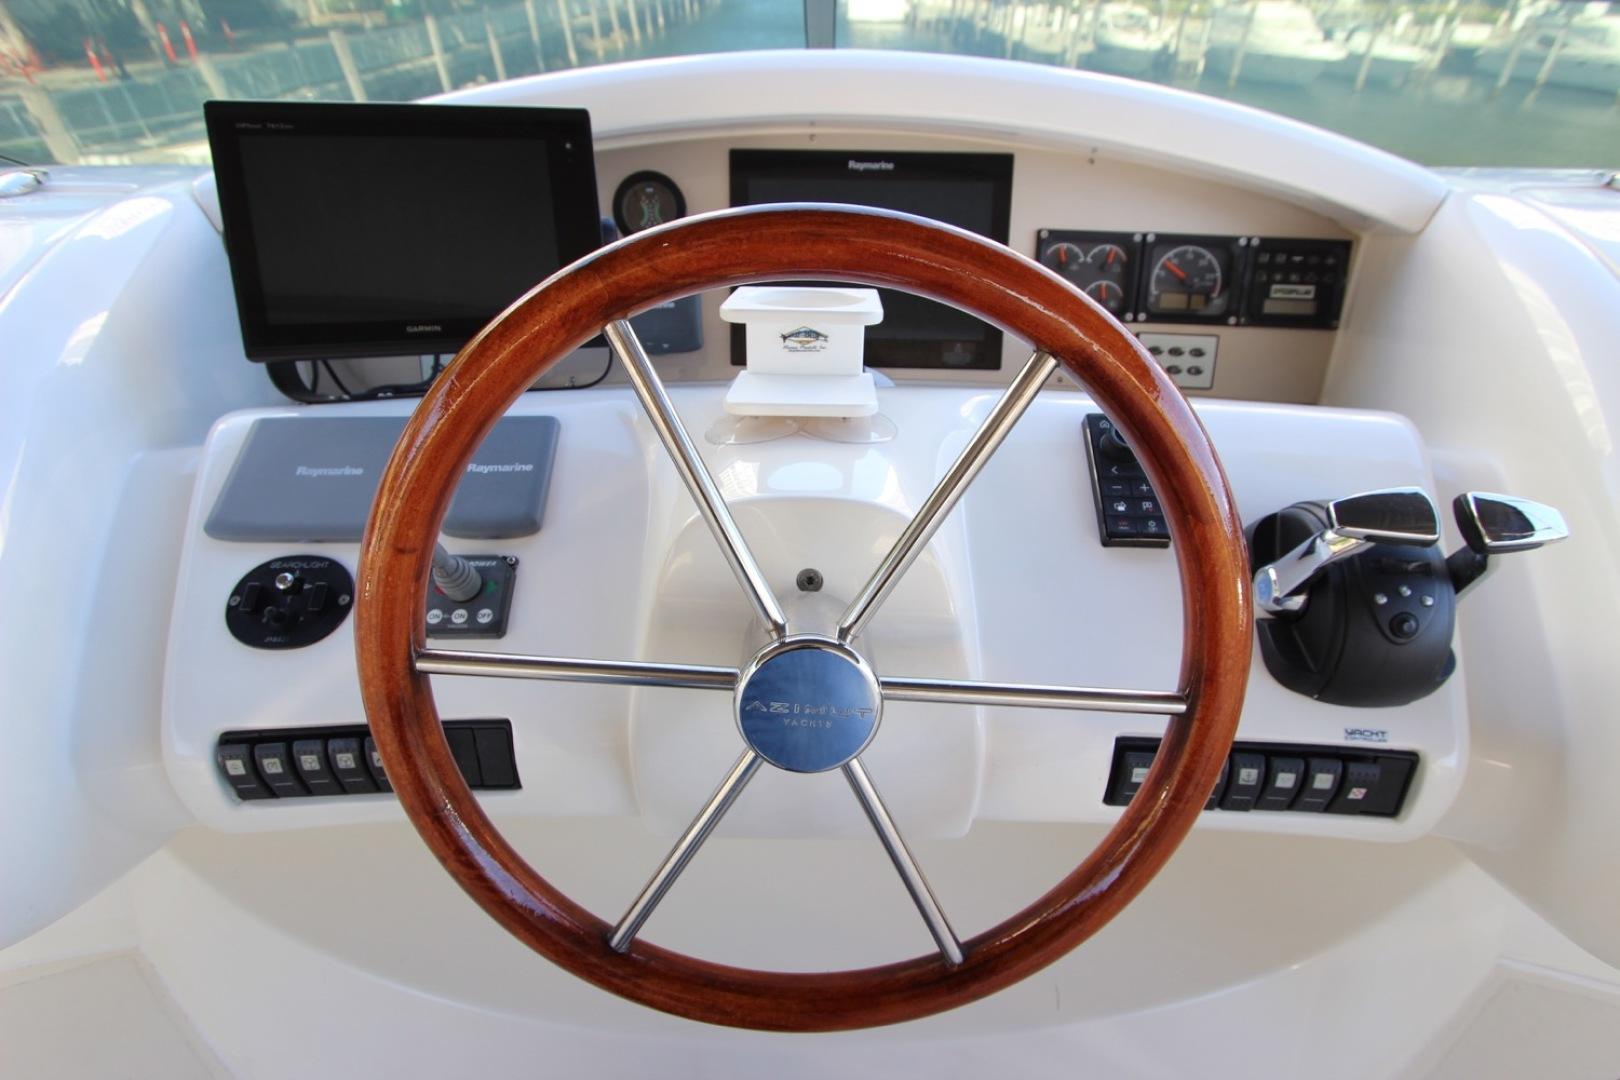 Azimut-2008 Azimut 80 2008-PURA VIDA Aventura-Florida-United States-2008 Azimut 80 Flybride for sale in Aventura -1145112 | Thumbnail